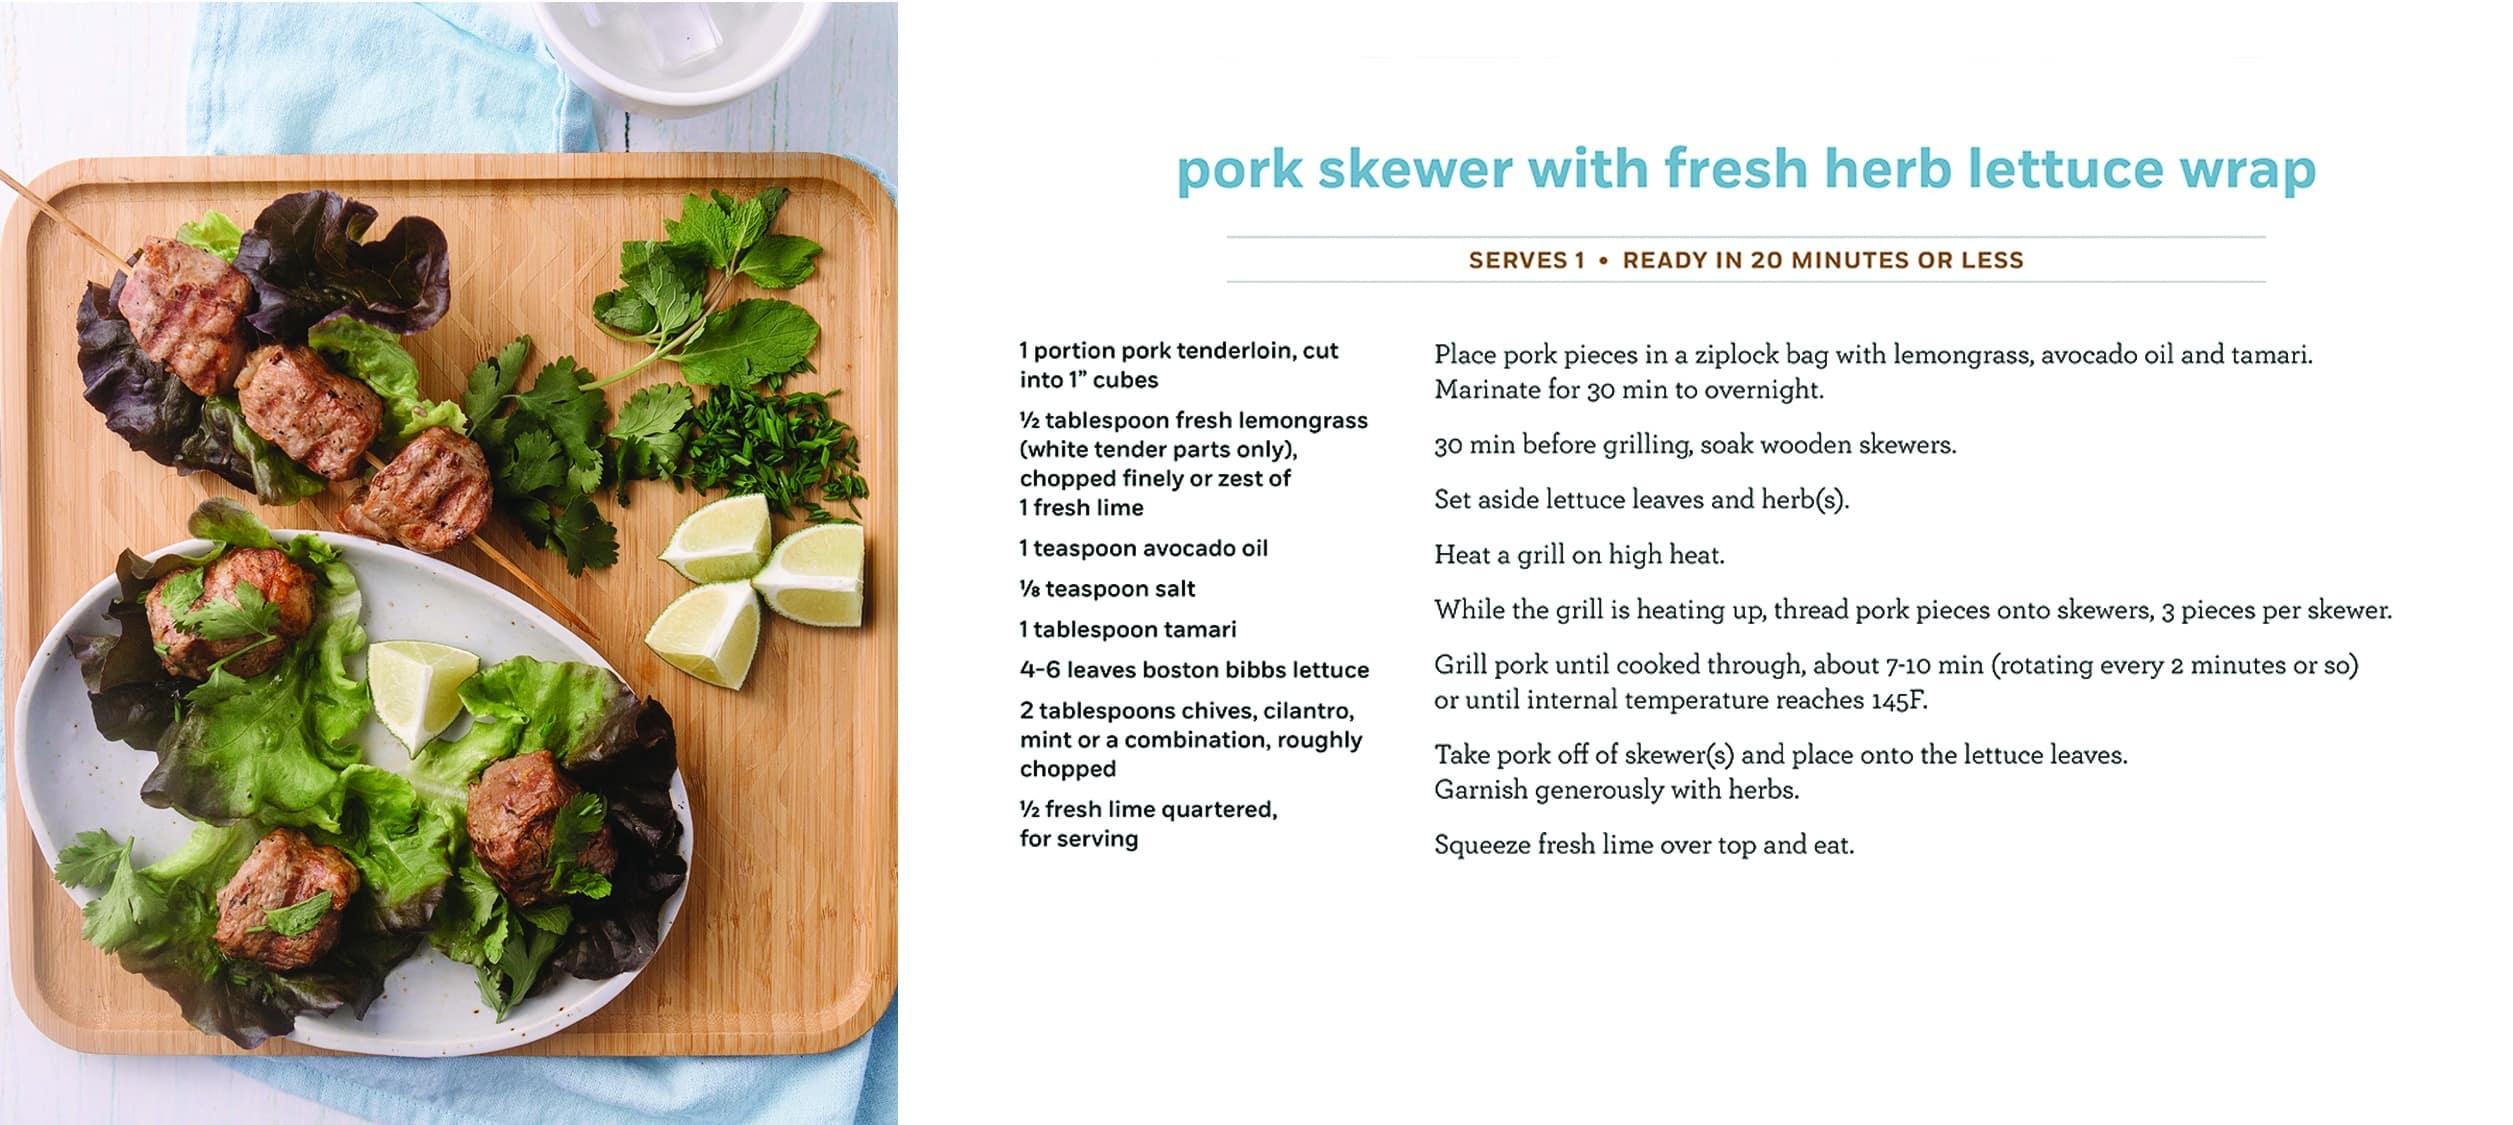 Pork Skewer Lettuce Wrap